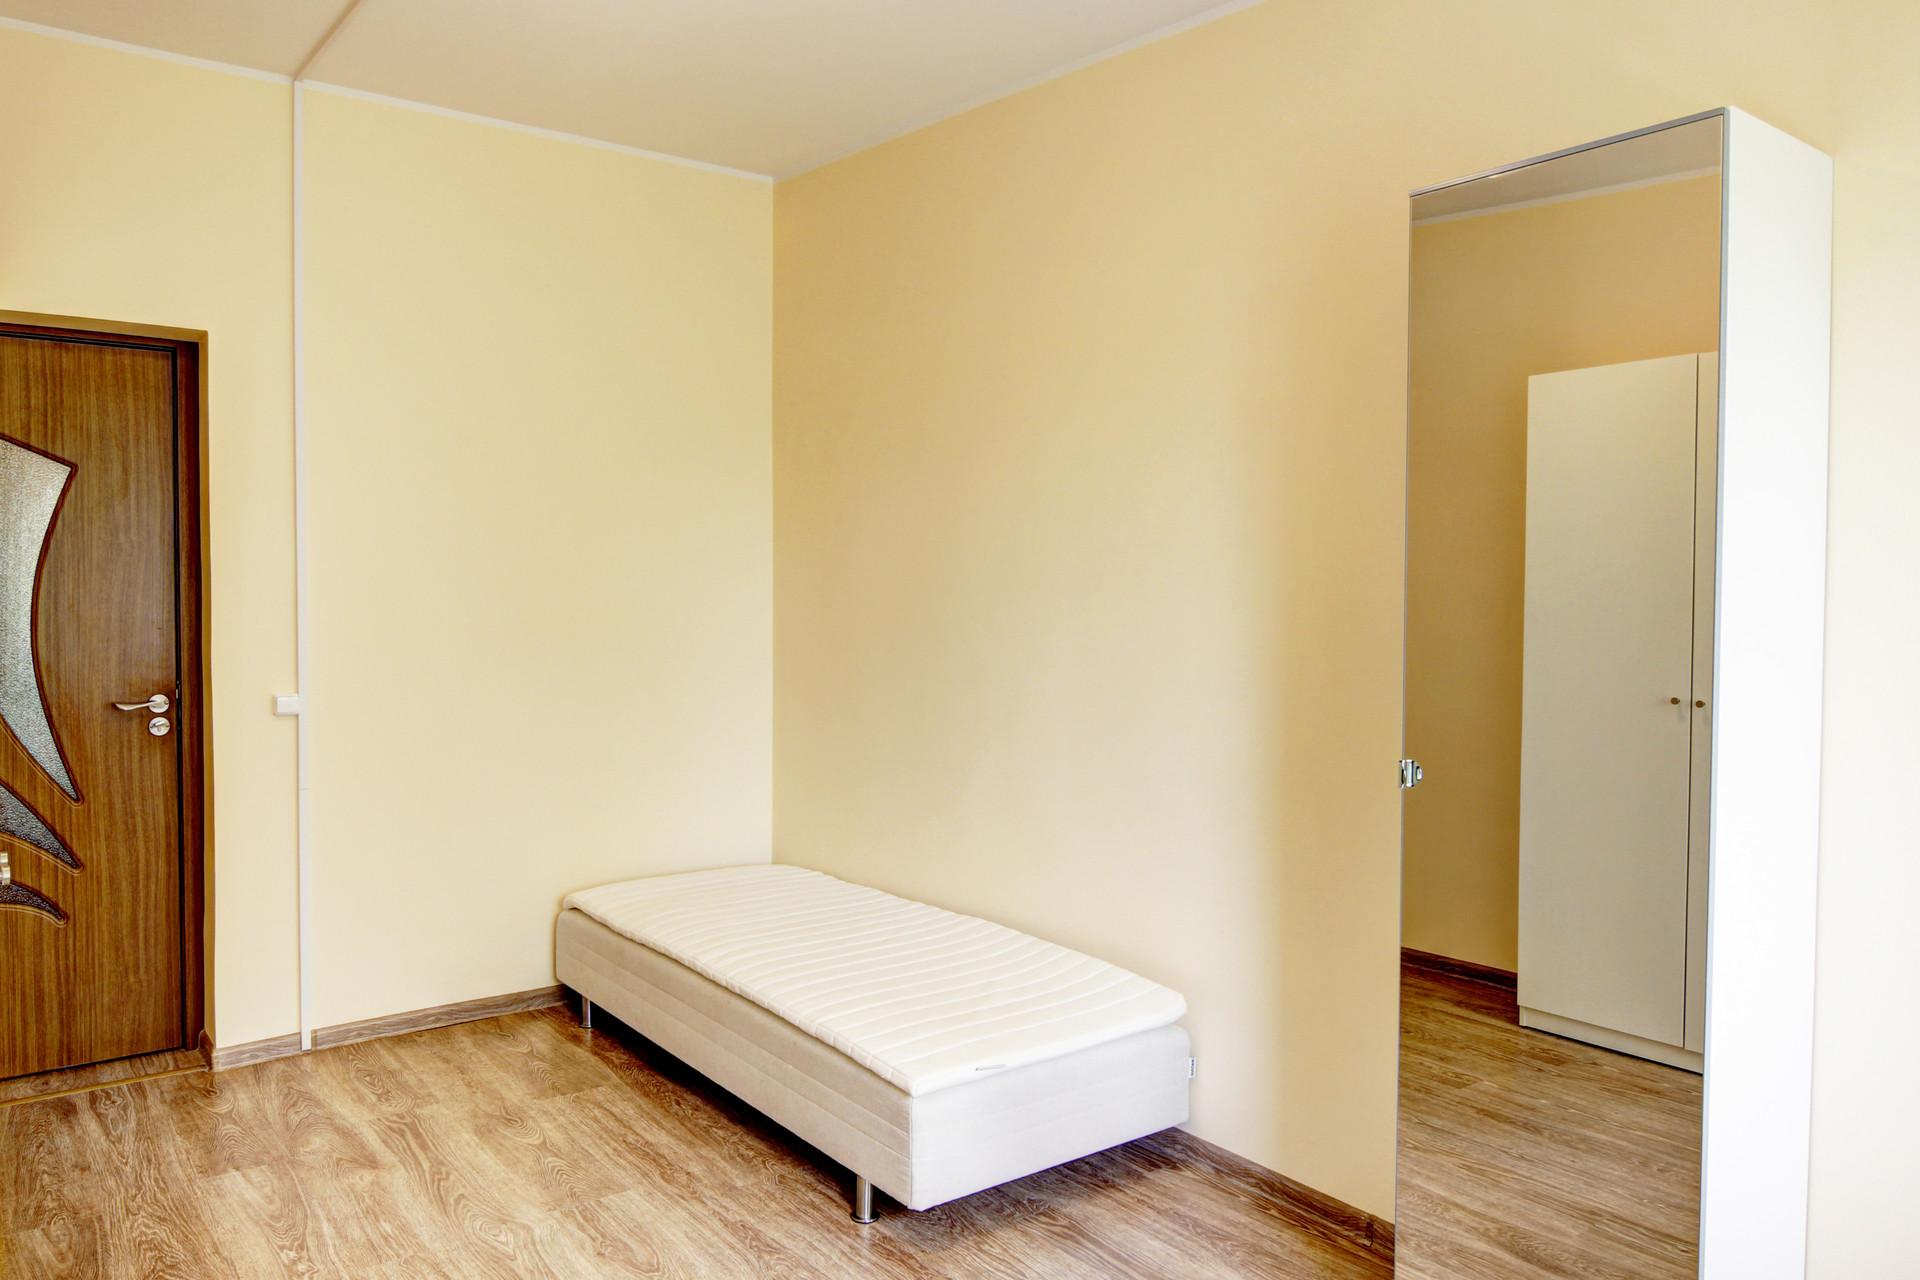 Awe Inspiring Spacious Room In 4 Room Apartment Near The Universities Beutiful Home Inspiration Semekurdistantinfo